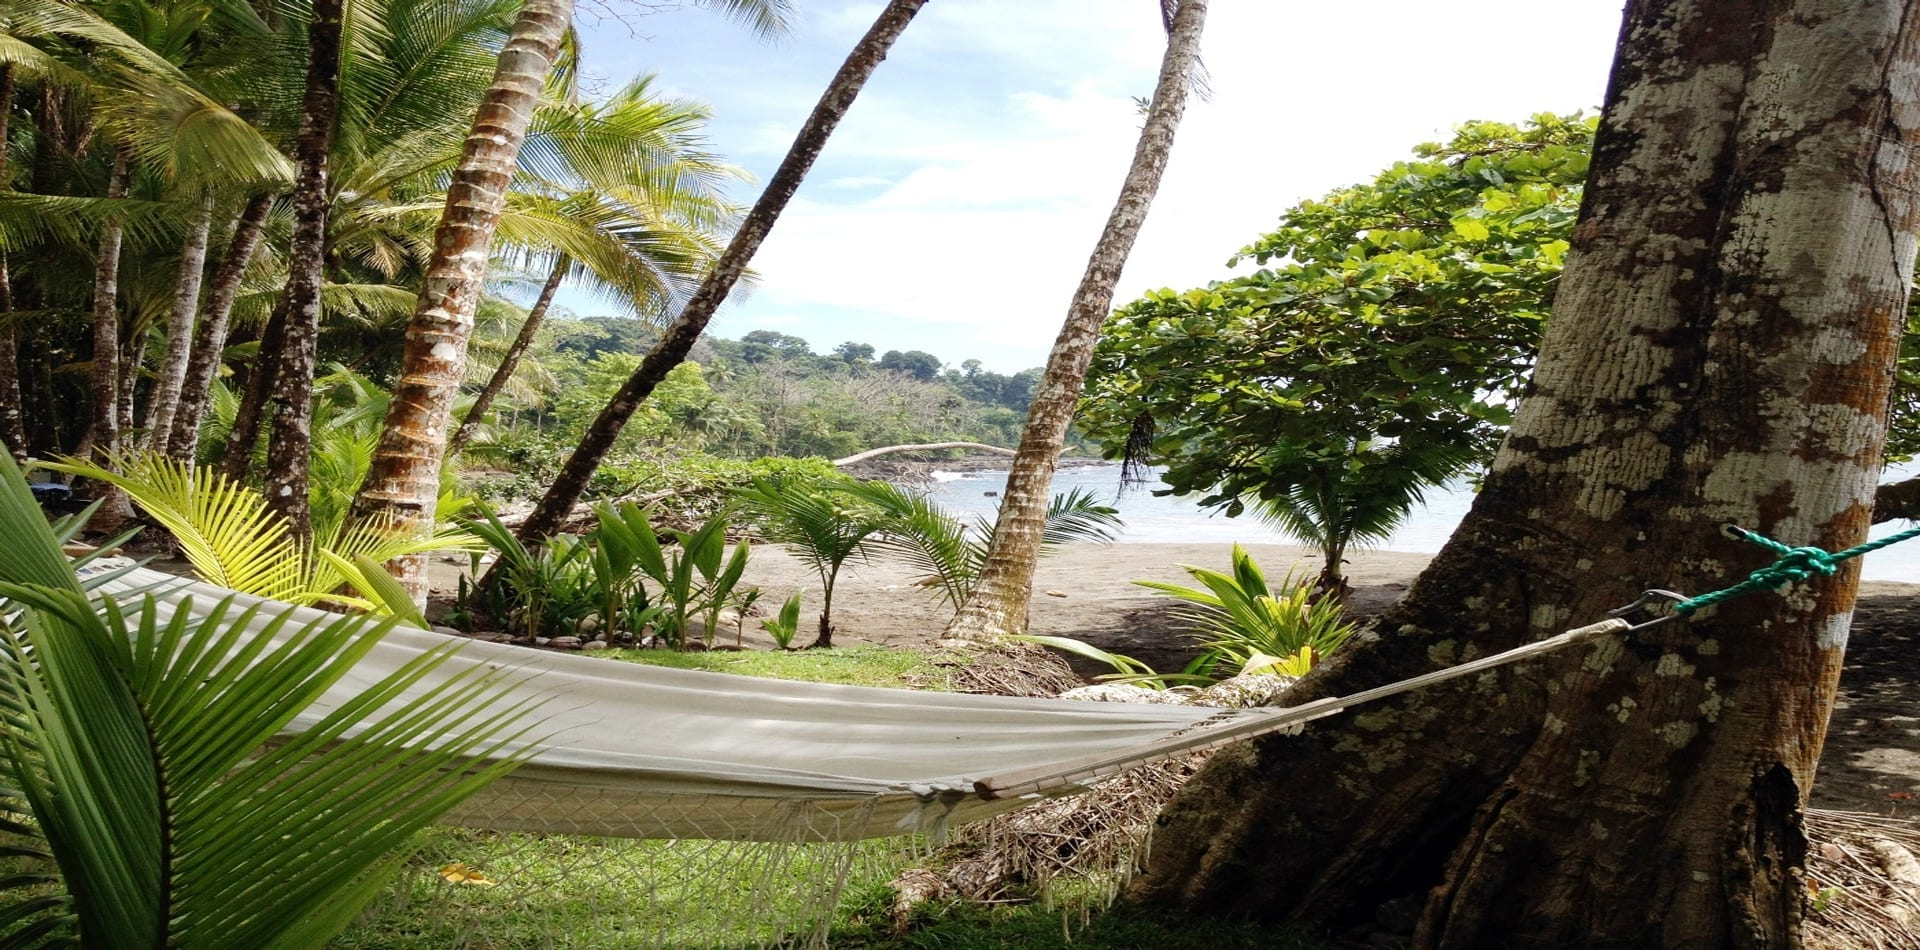 HERO Costa Rica Casa Corcovado Hammock Beach